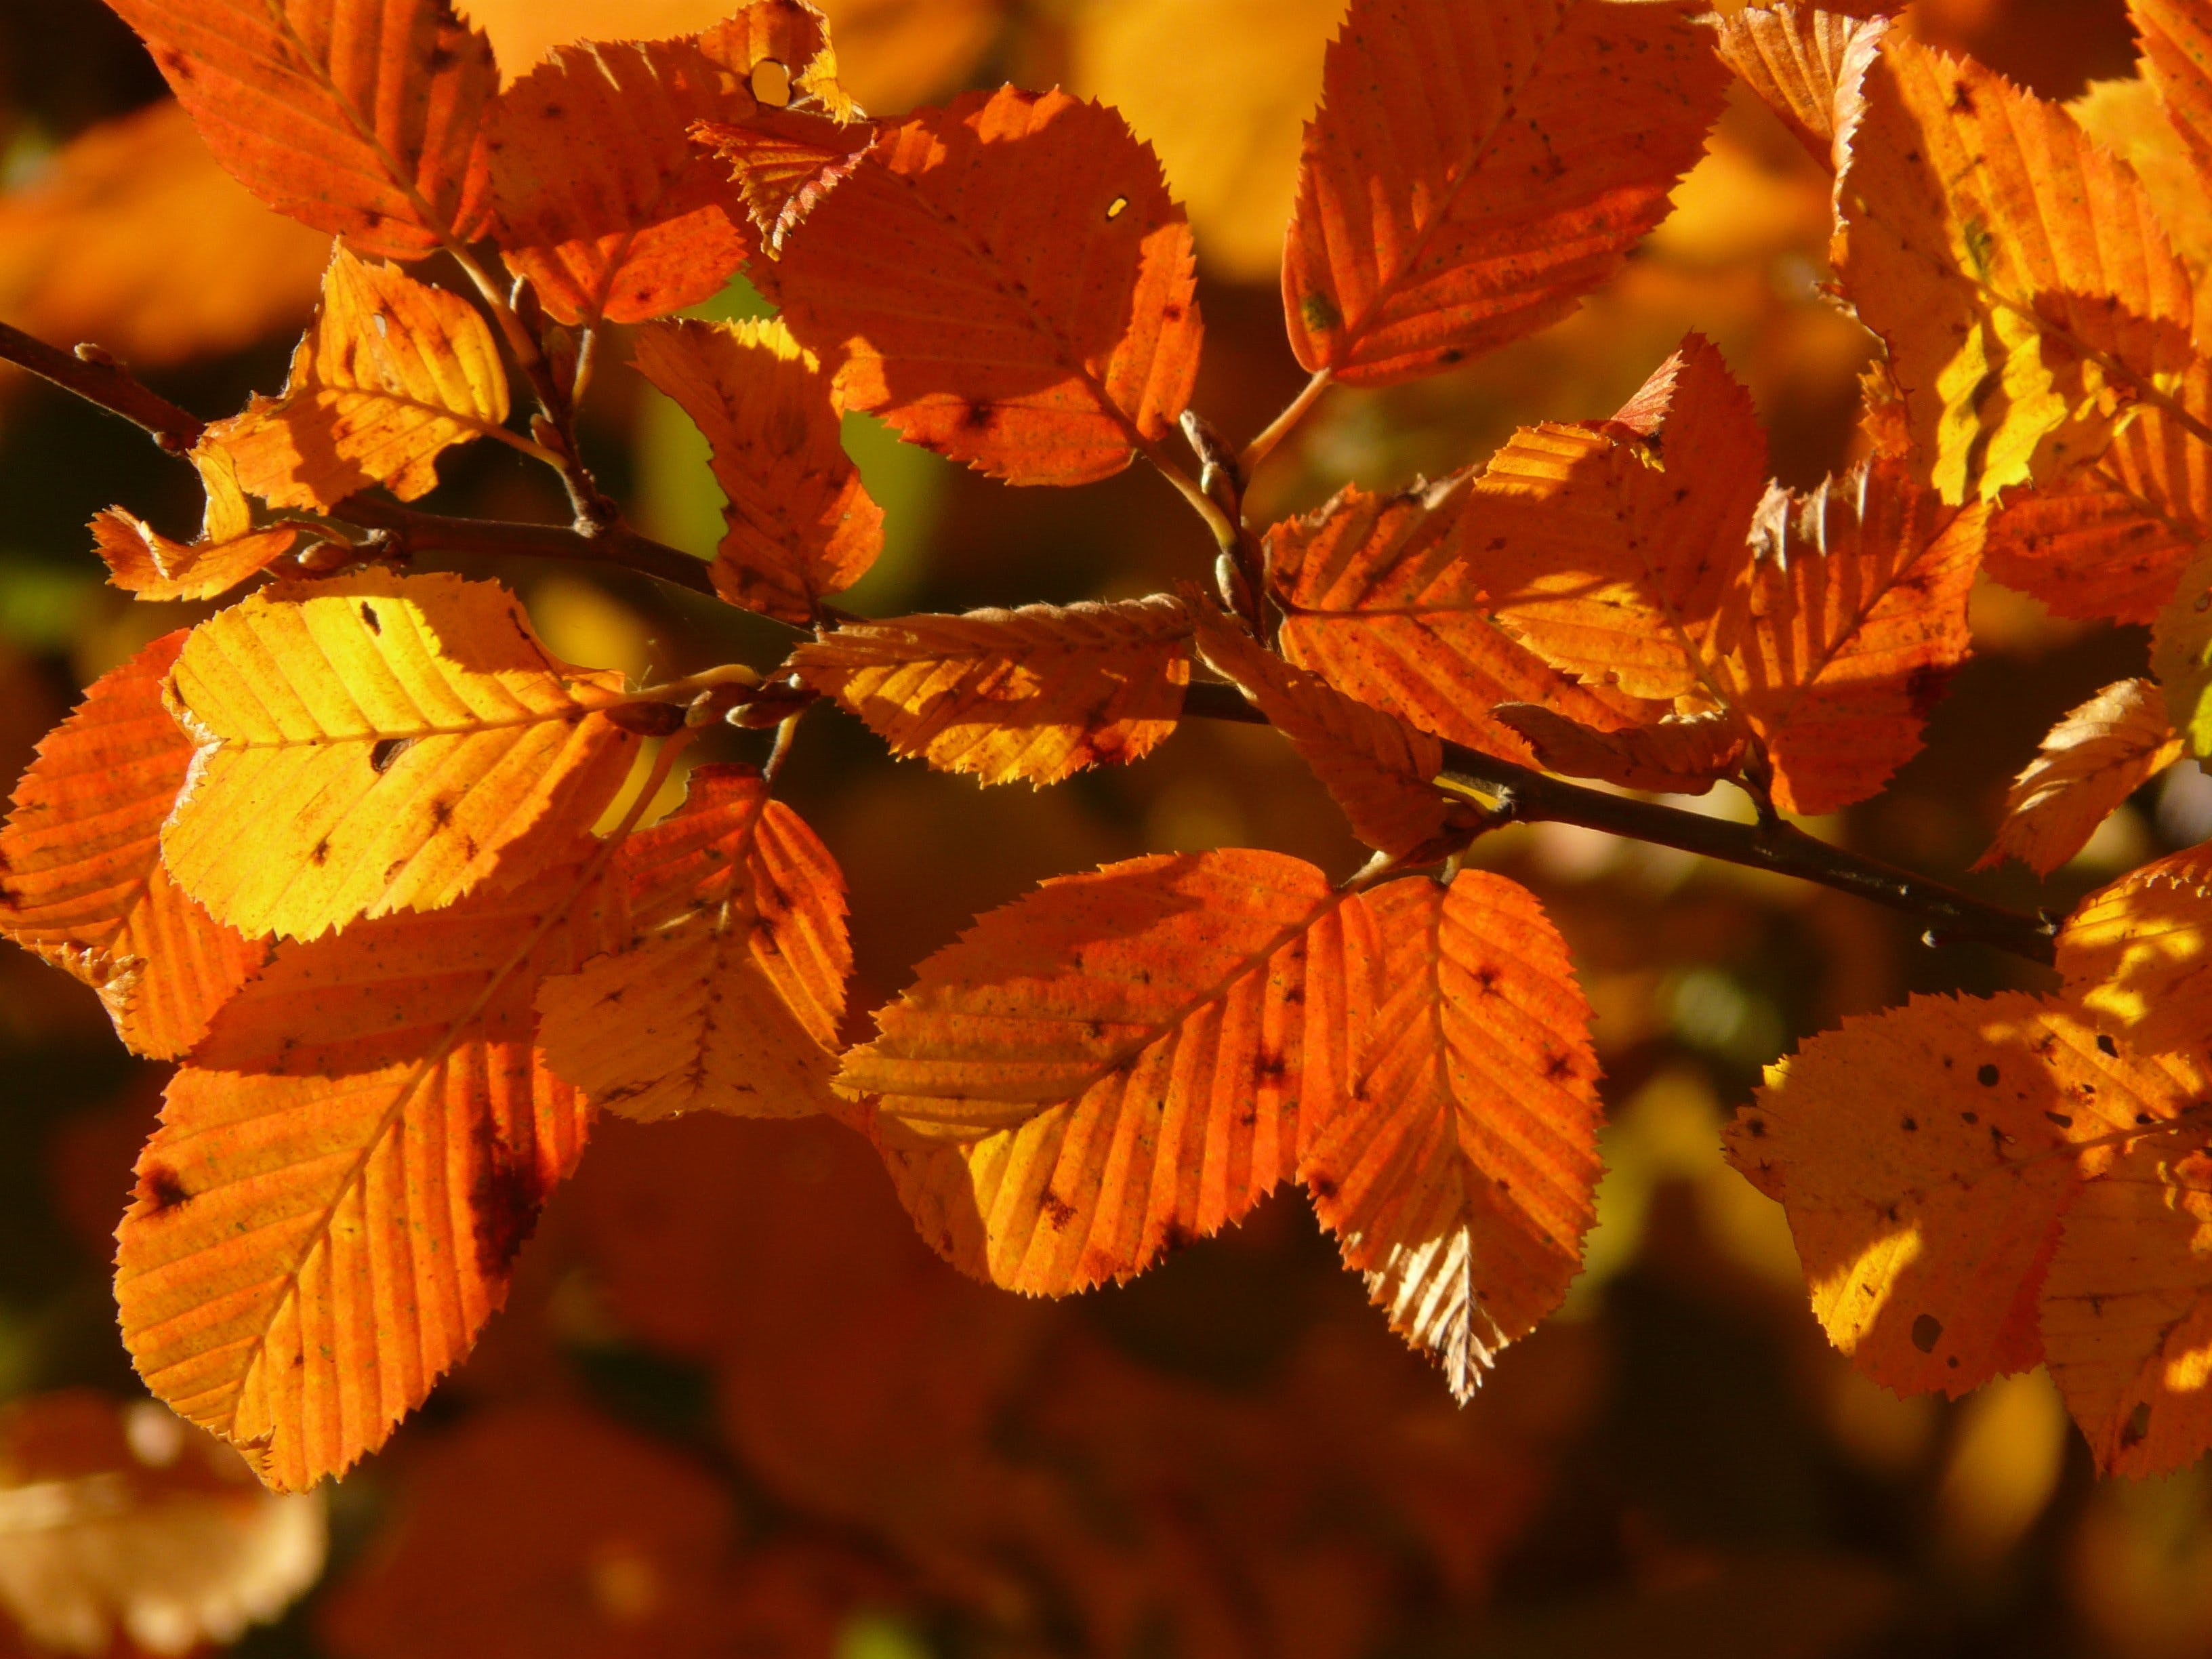 Free stock photo of autumn, autumn forest, colorful, fall foliage